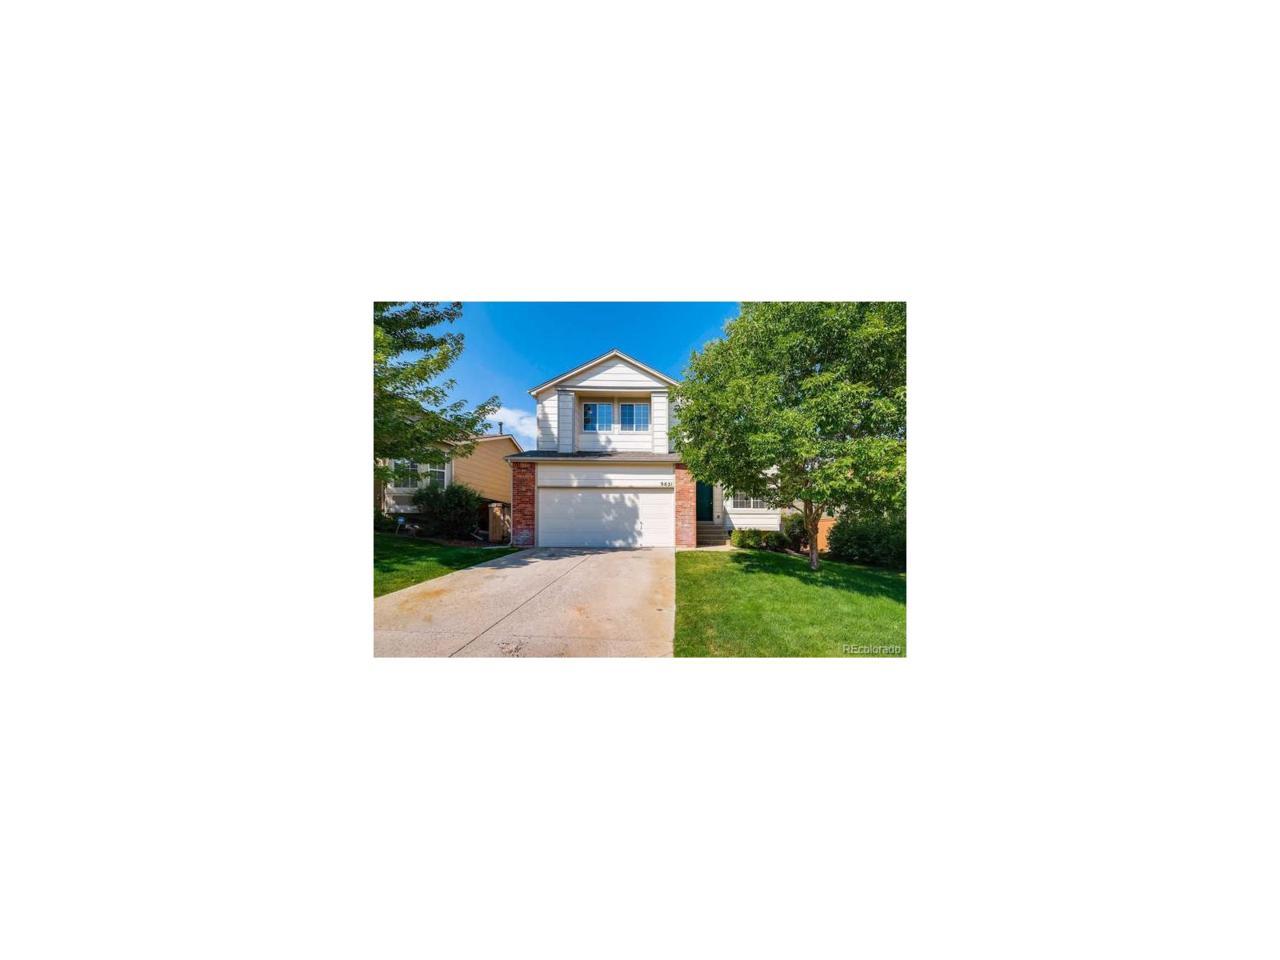 9621 Castle Ridge Circle, Highlands Ranch, CO 80129 (MLS #8112416) :: 8z Real Estate